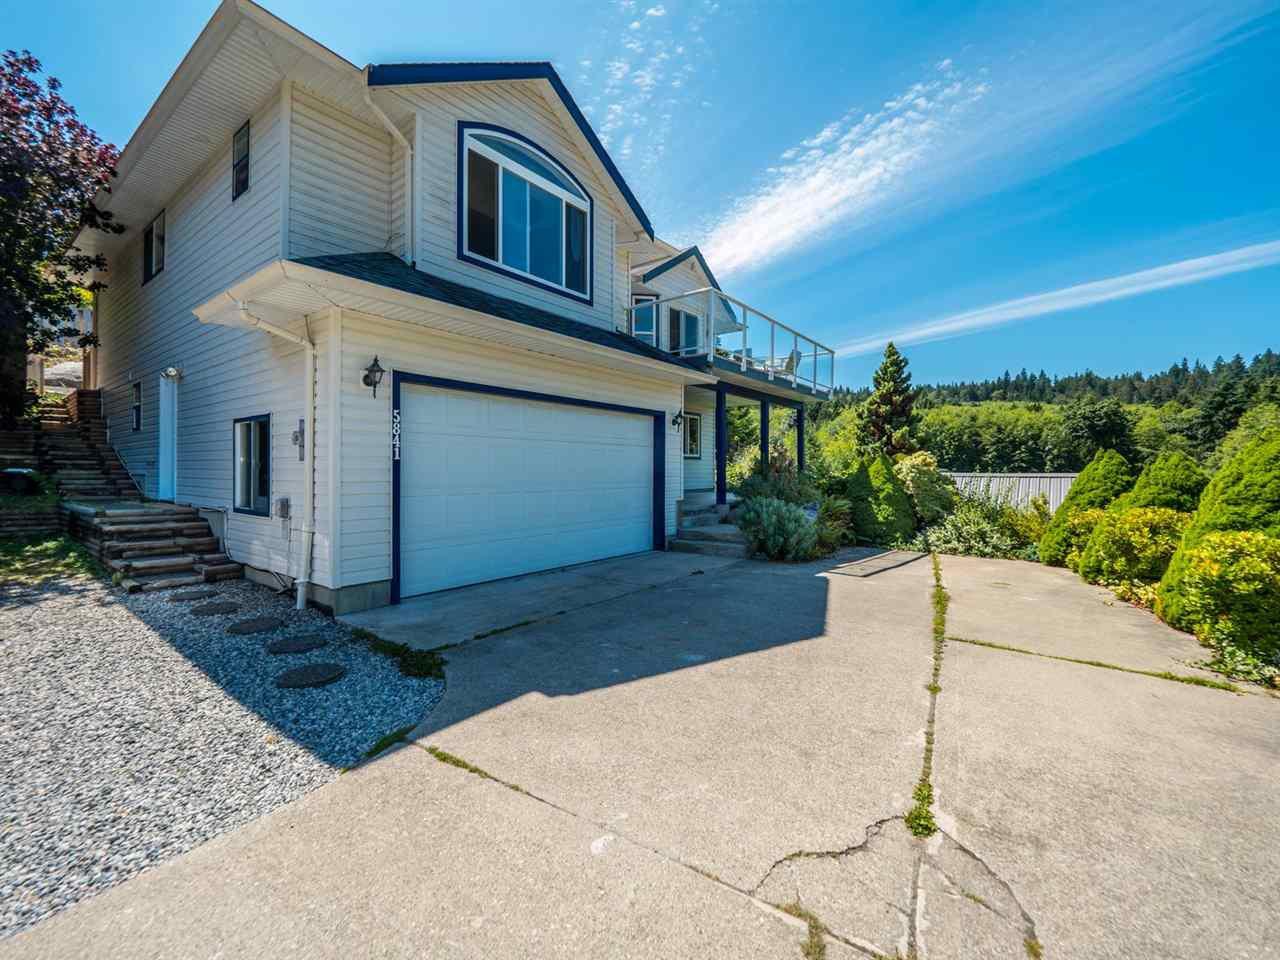 Main Photo: 5841 MARINE Way in Sechelt: Sechelt District House for sale (Sunshine Coast)  : MLS®# R2474409